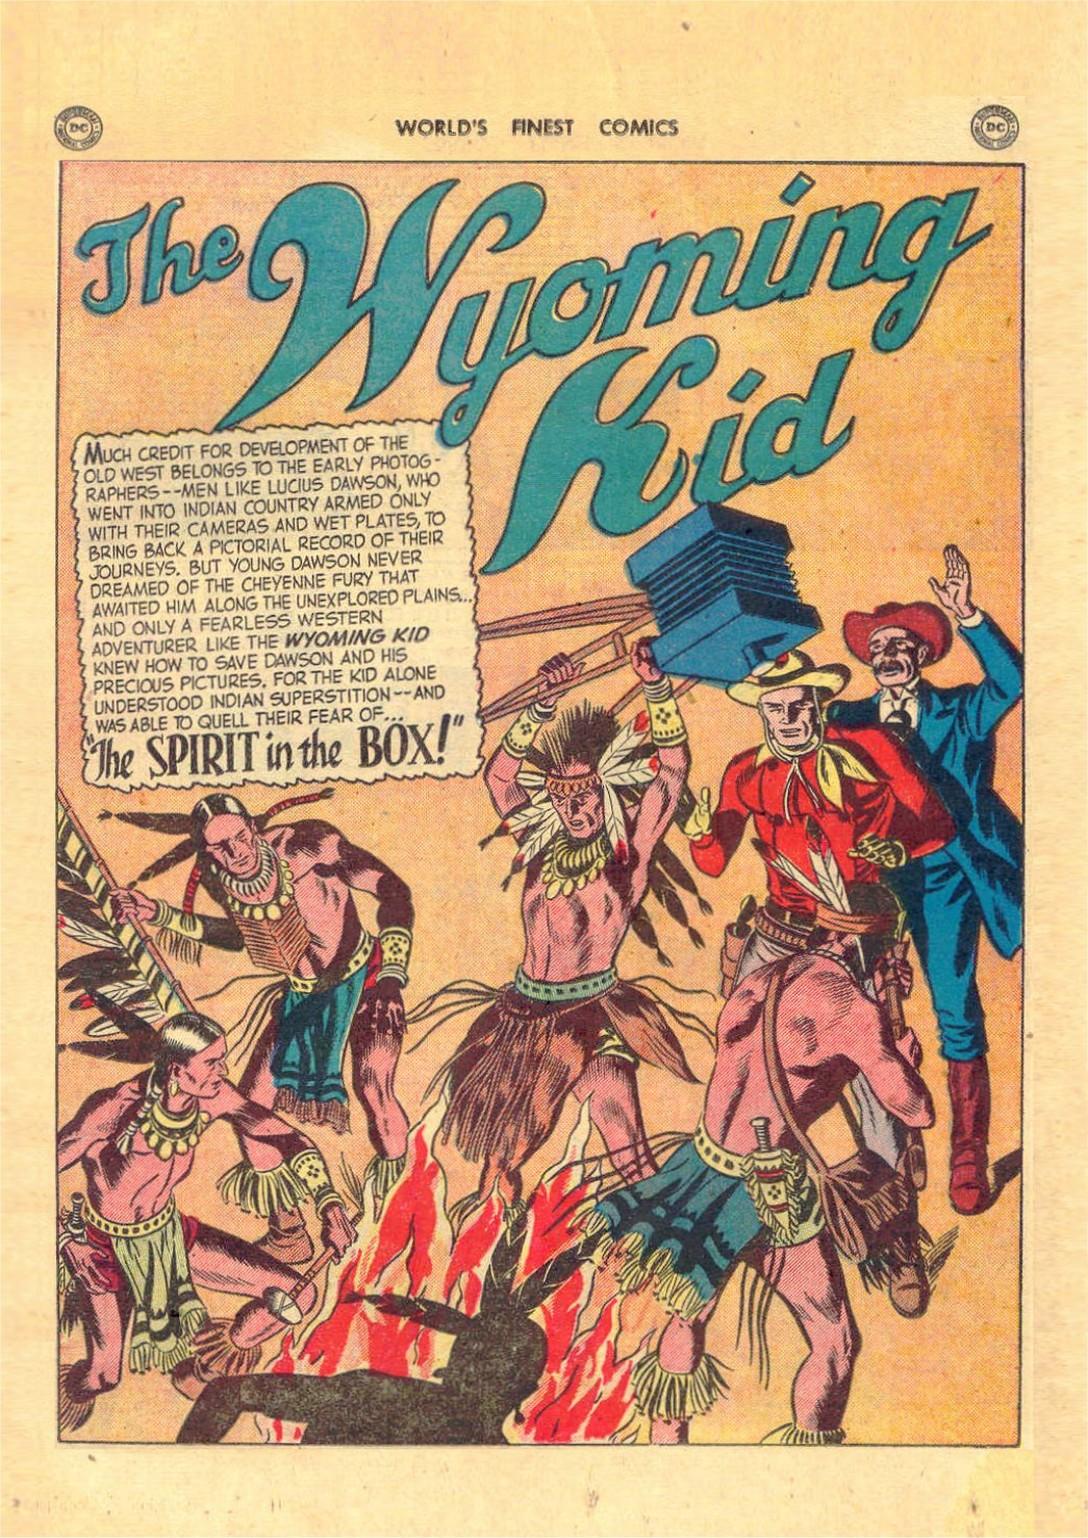 Read online World's Finest Comics comic -  Issue #52 - 15